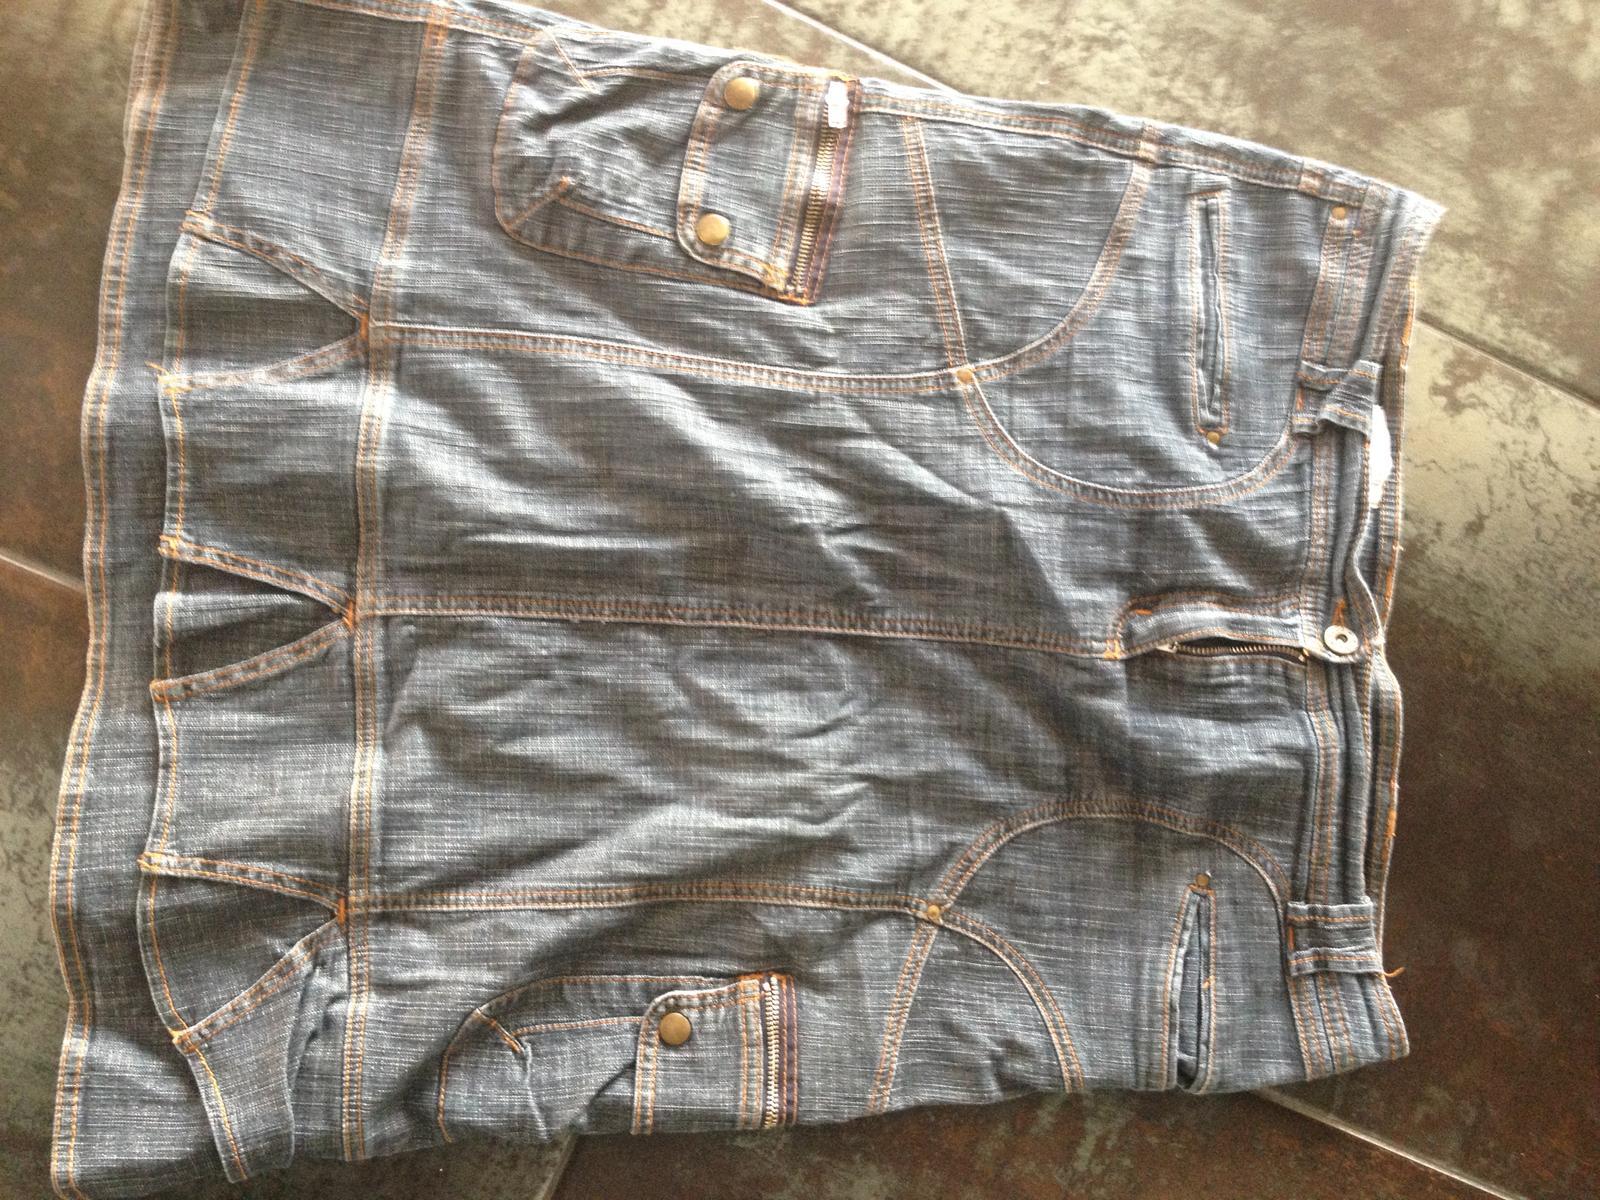 278a852b78f6 Černošedá sukně z elastické lehčí rifloviny